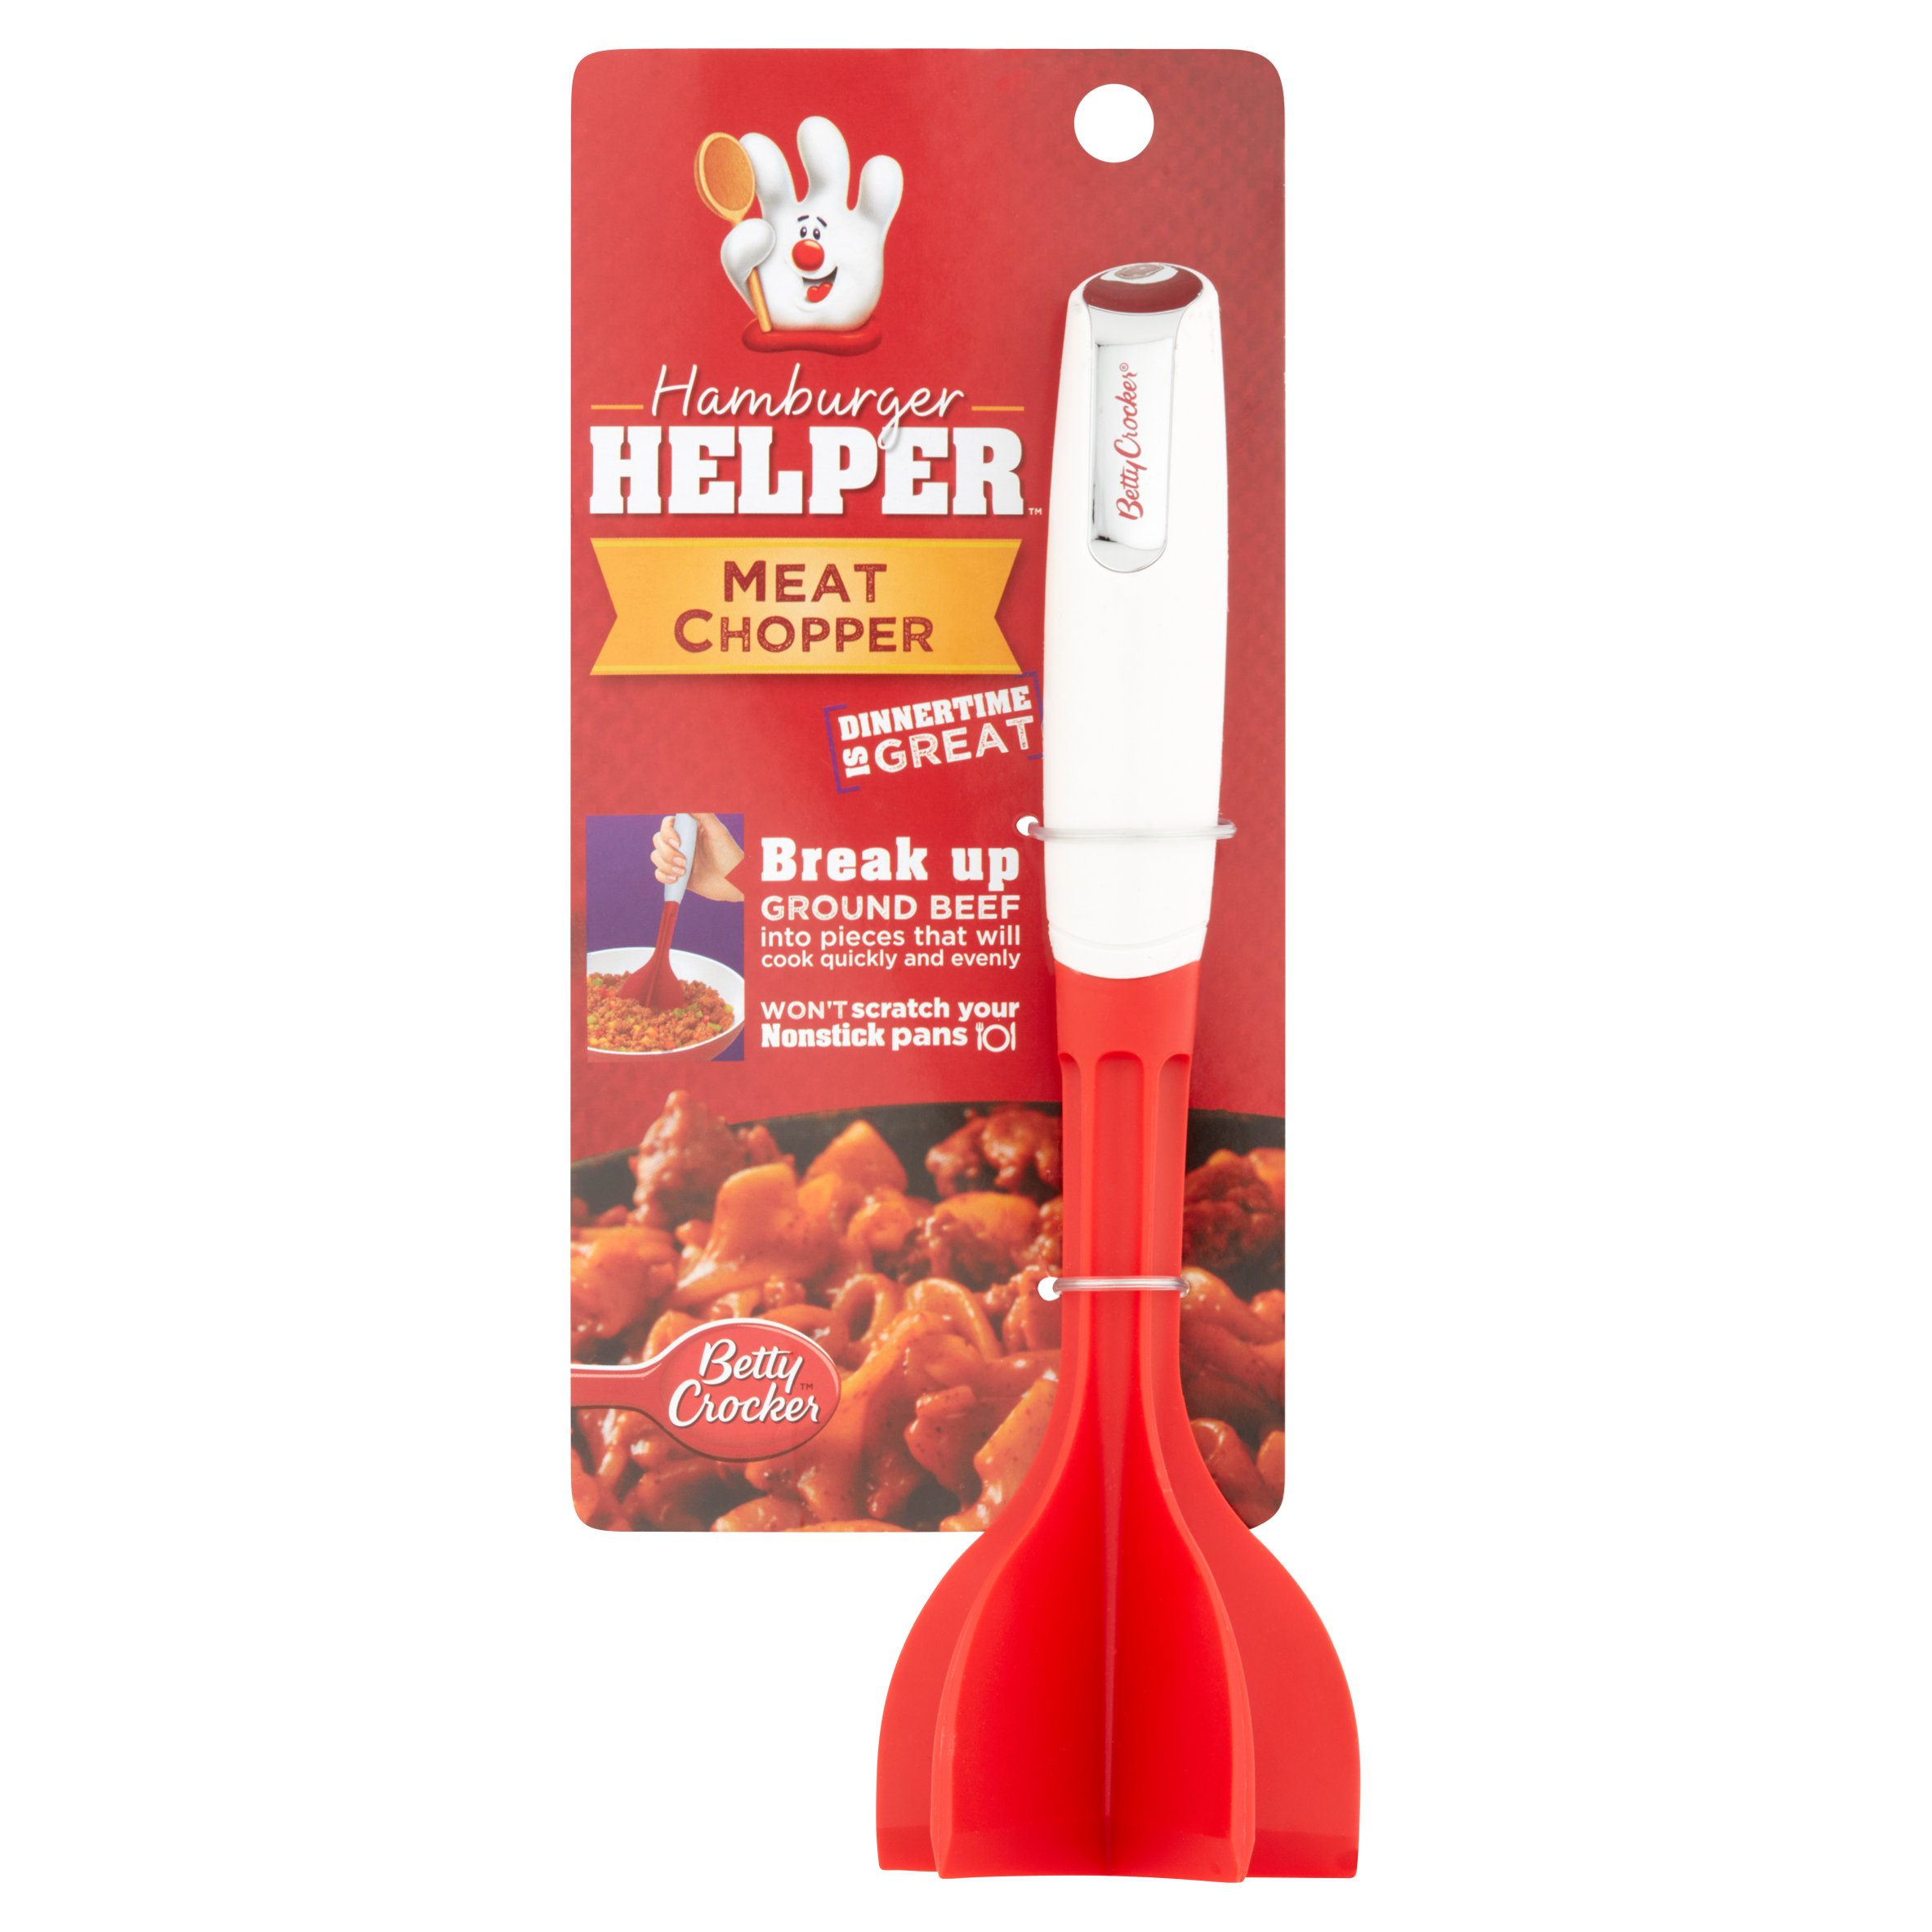 Betty Crocker Hamburger Helper Meat Chopper by Bradshaw International, Inc.